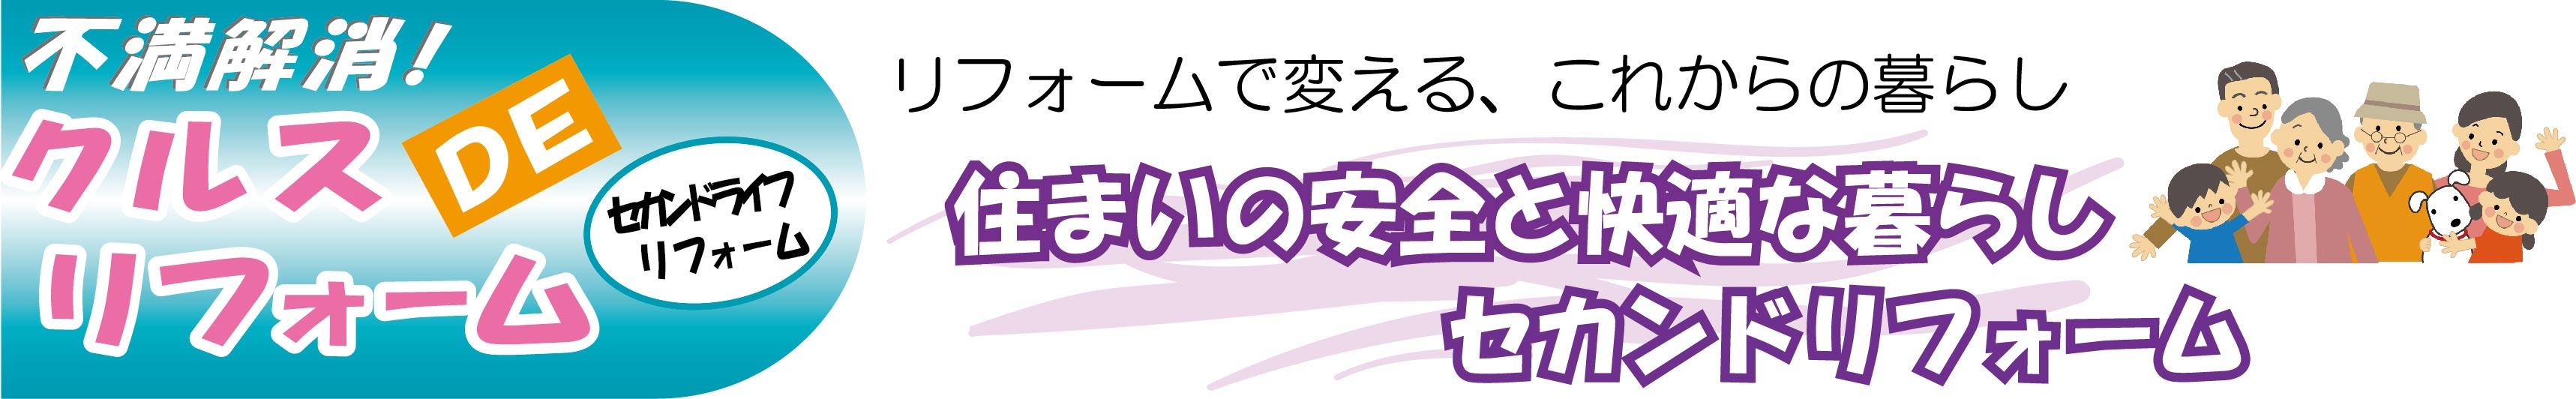 KuraSi-natu-sin90-11.jpg